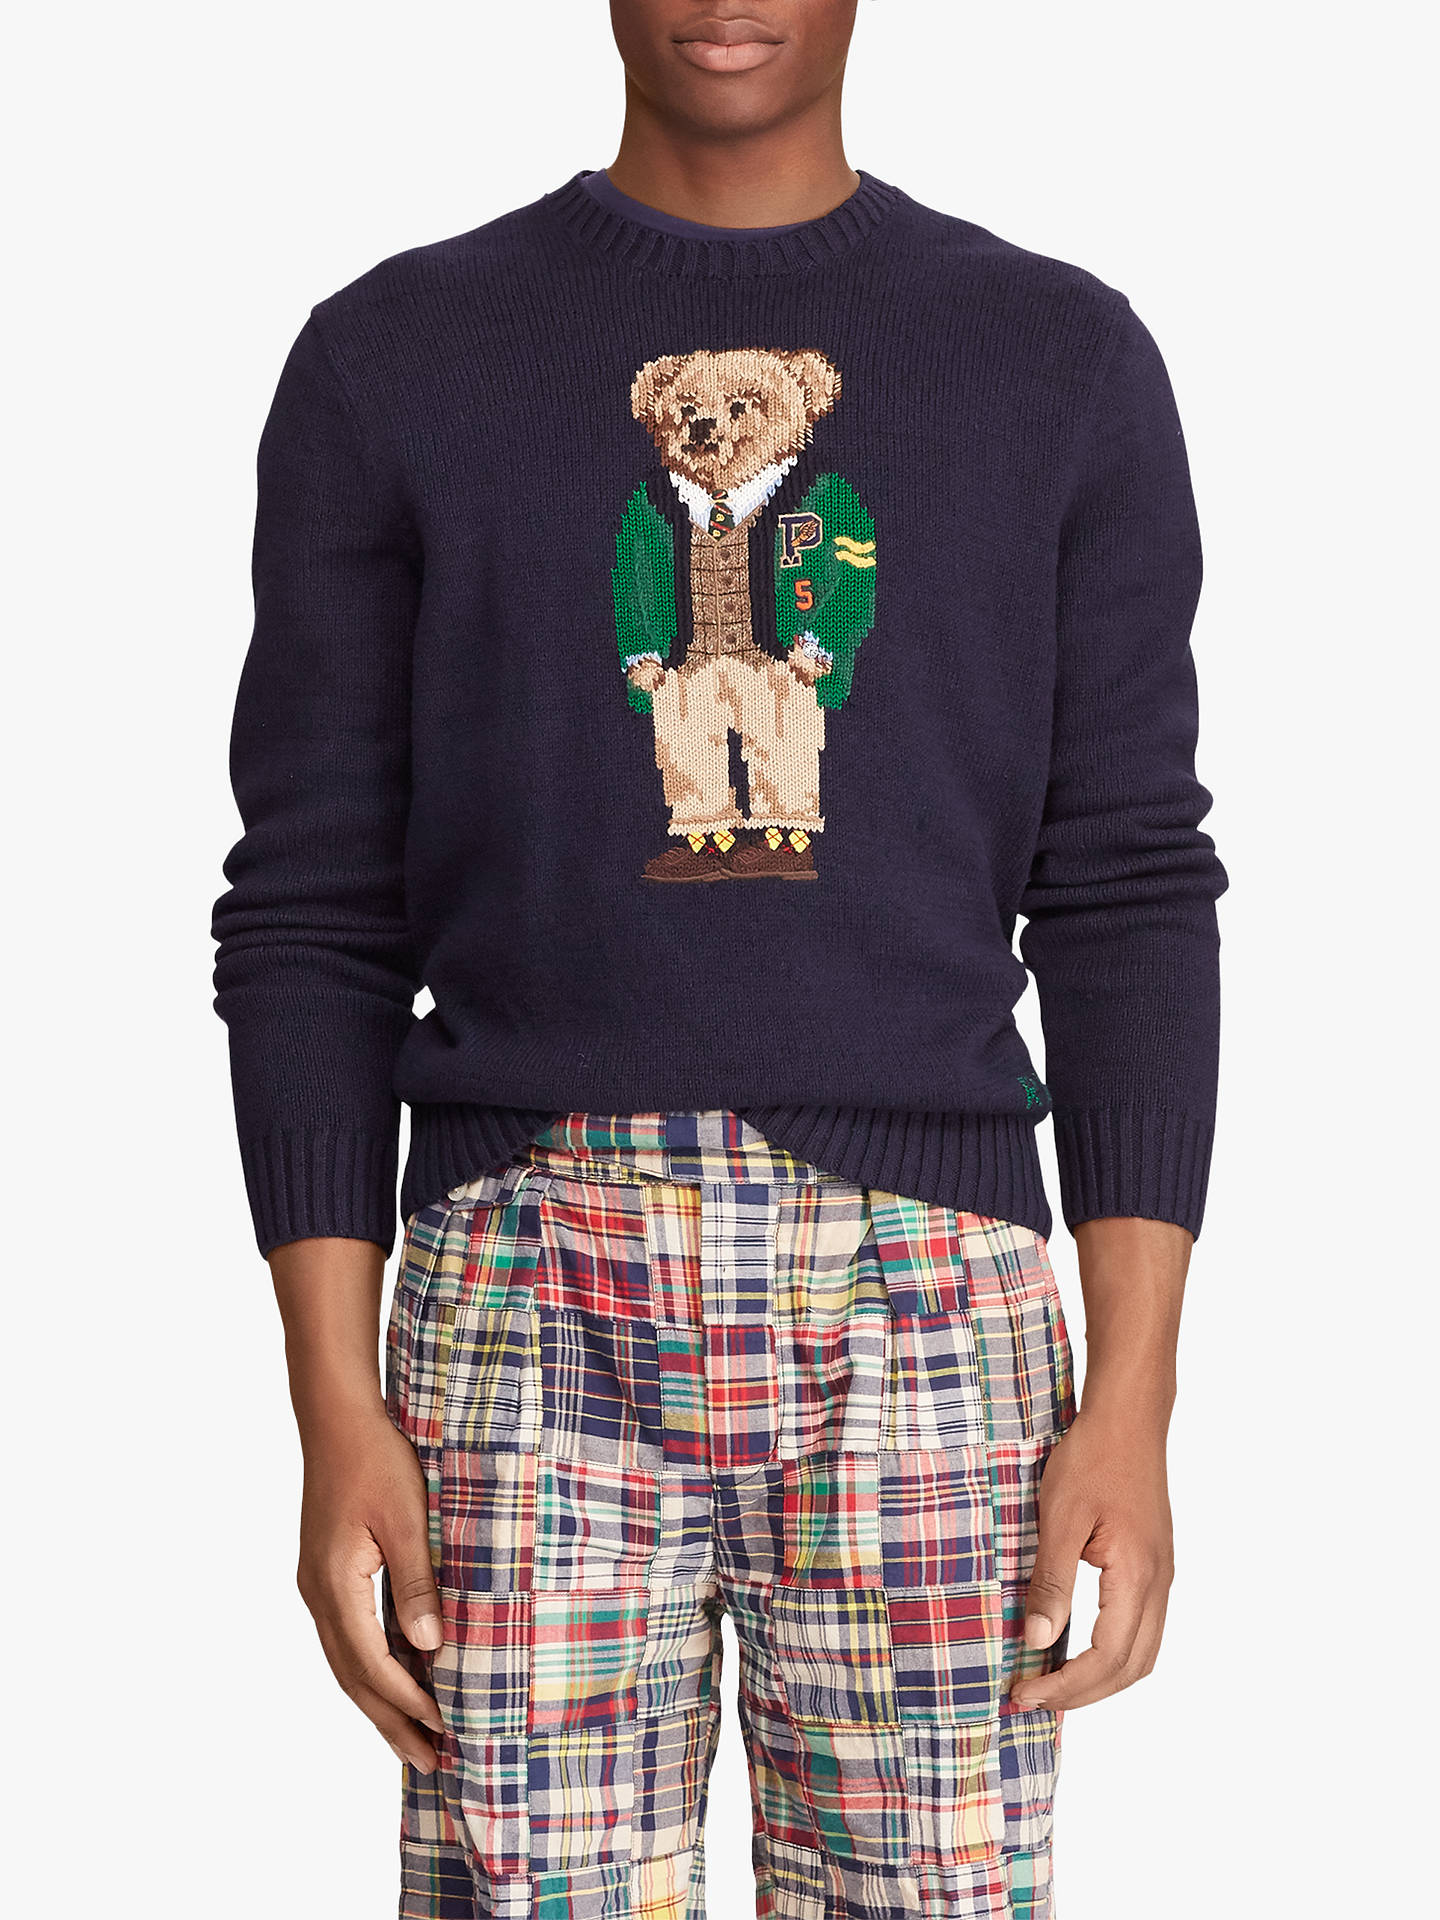 db81f79dcc Polo Ralph Lauren University Bear Sweater, Navy